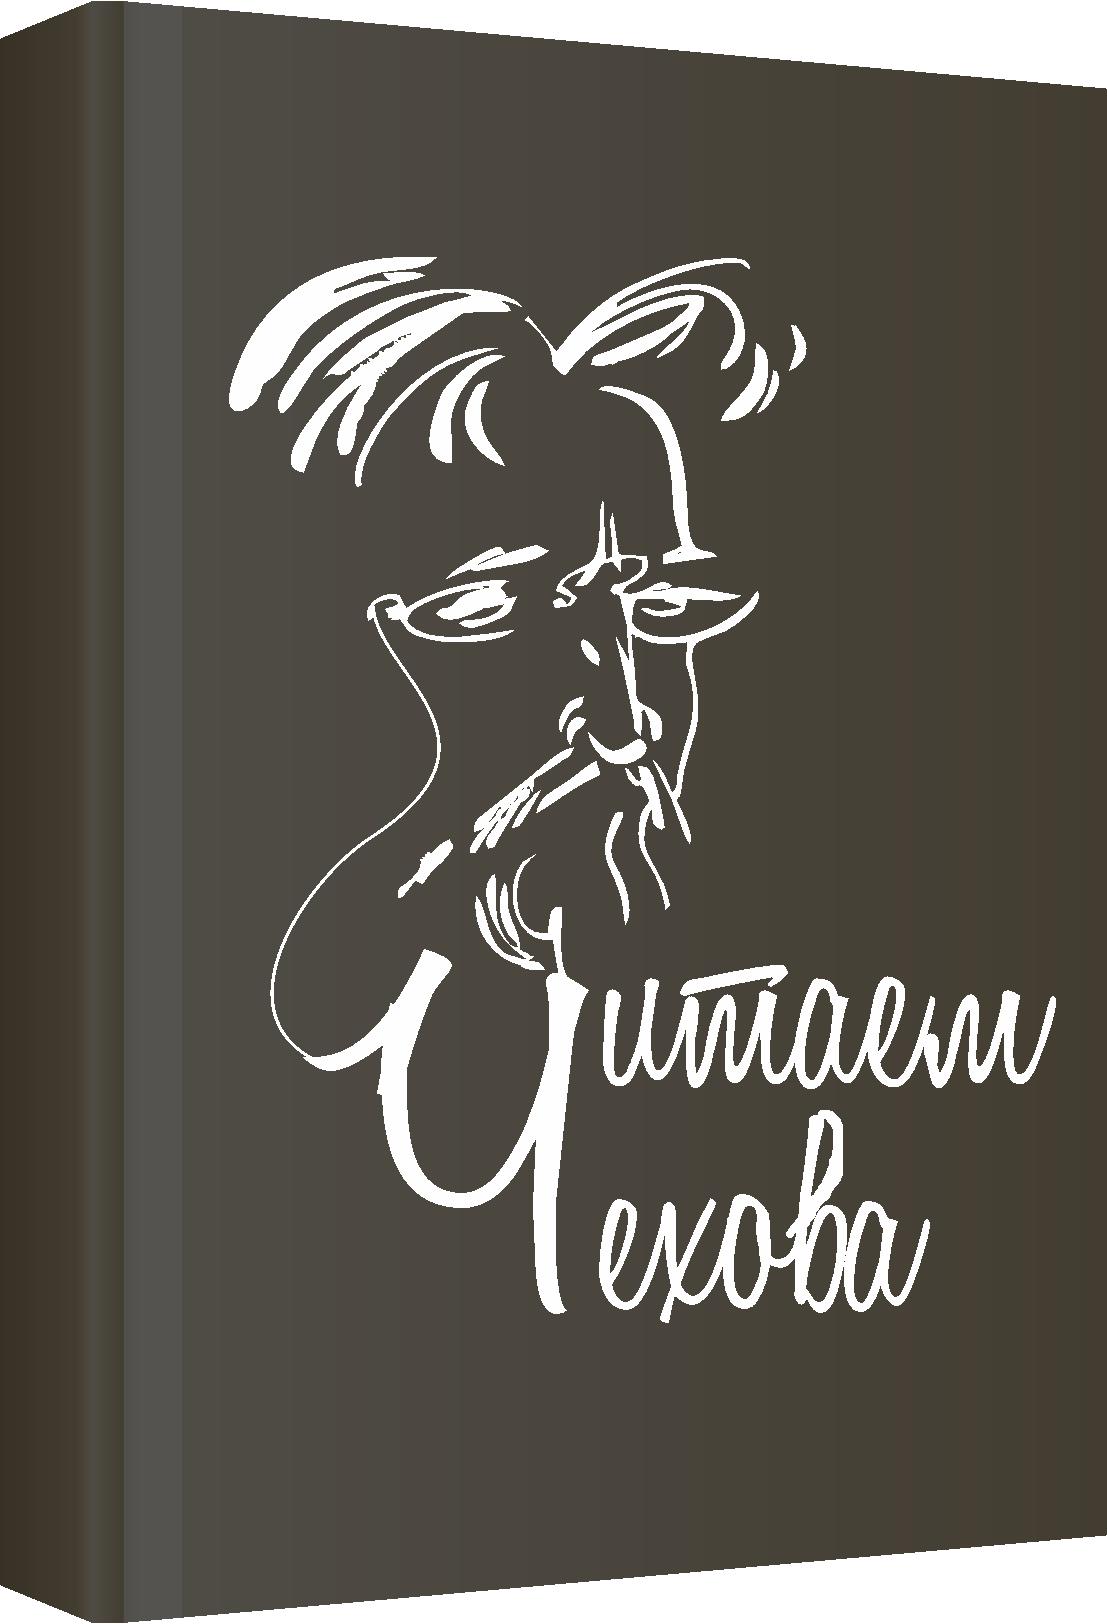 Читаем Чехова логотип фестиваля конкурса